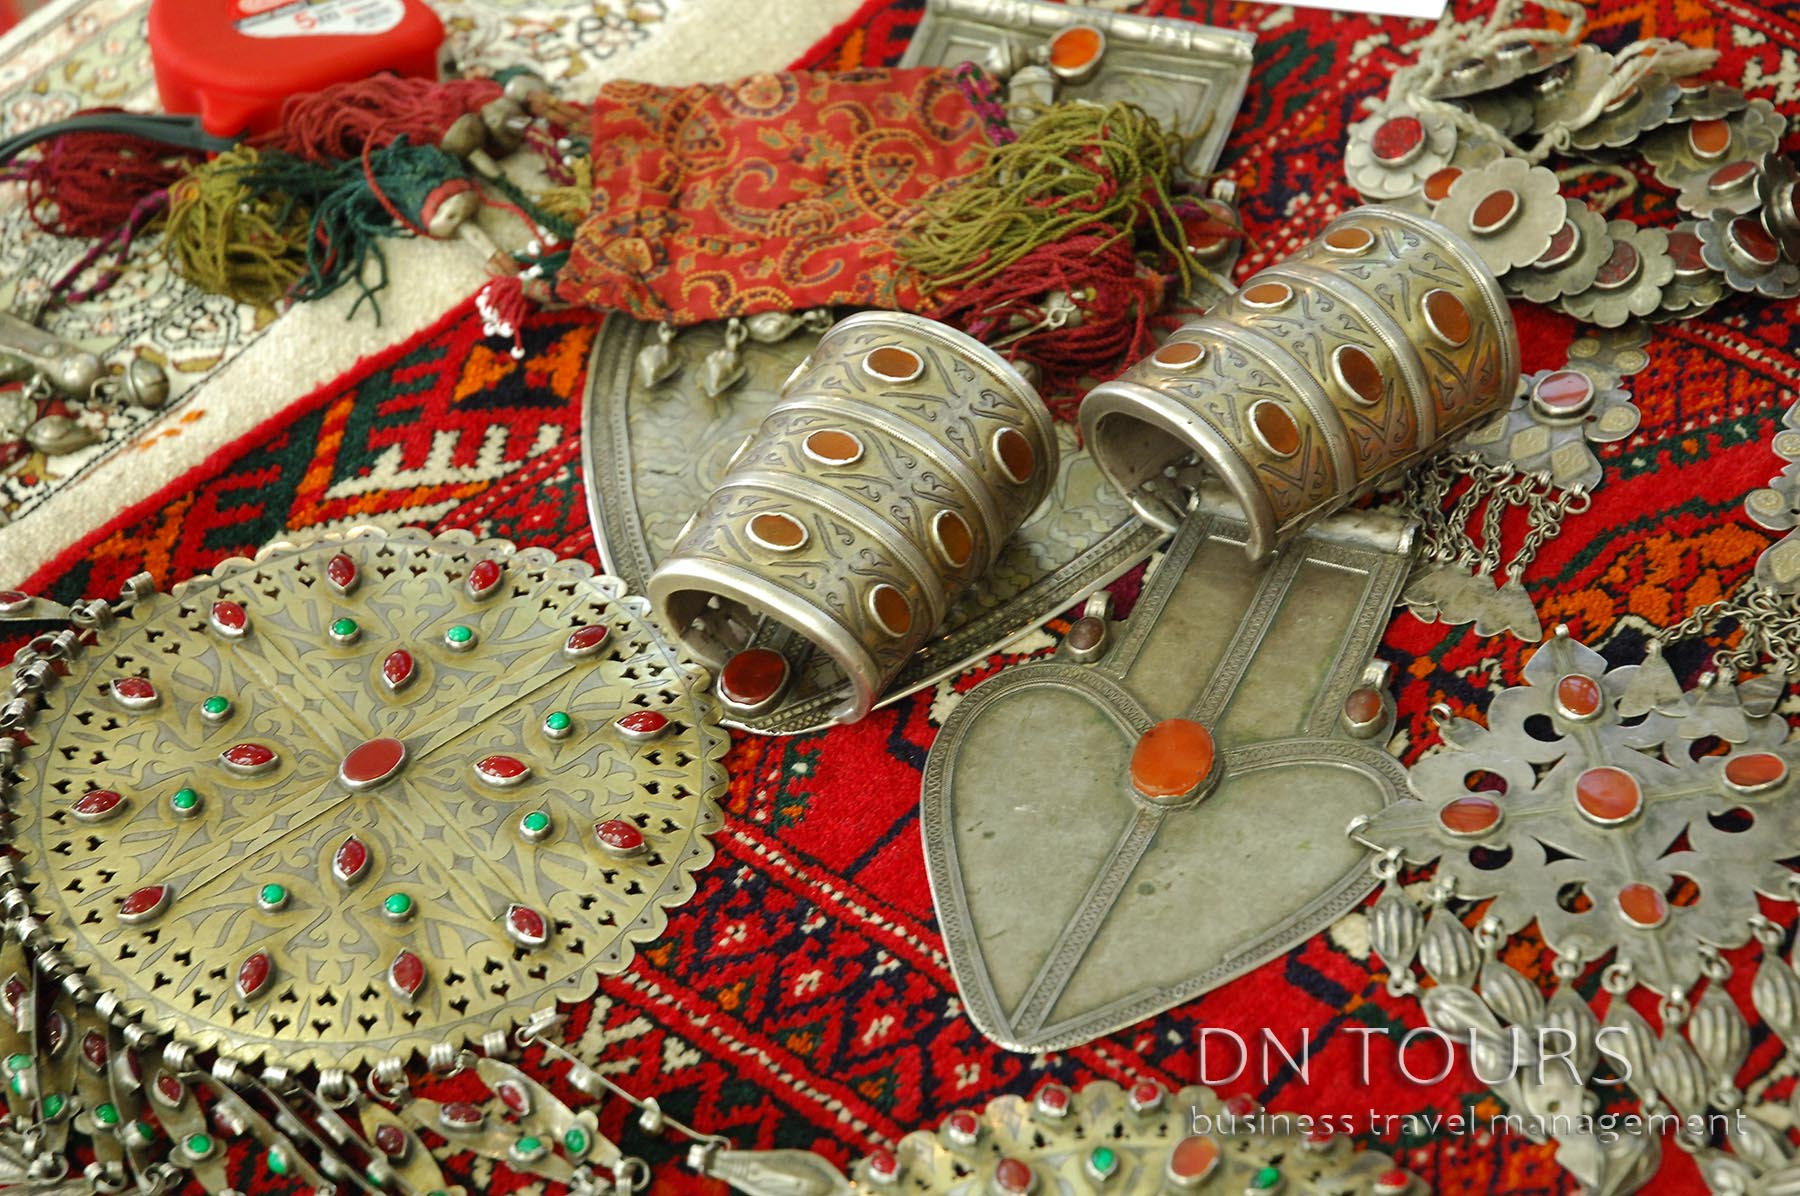 Национальные особенности Туркмен, Туркменистан (14)